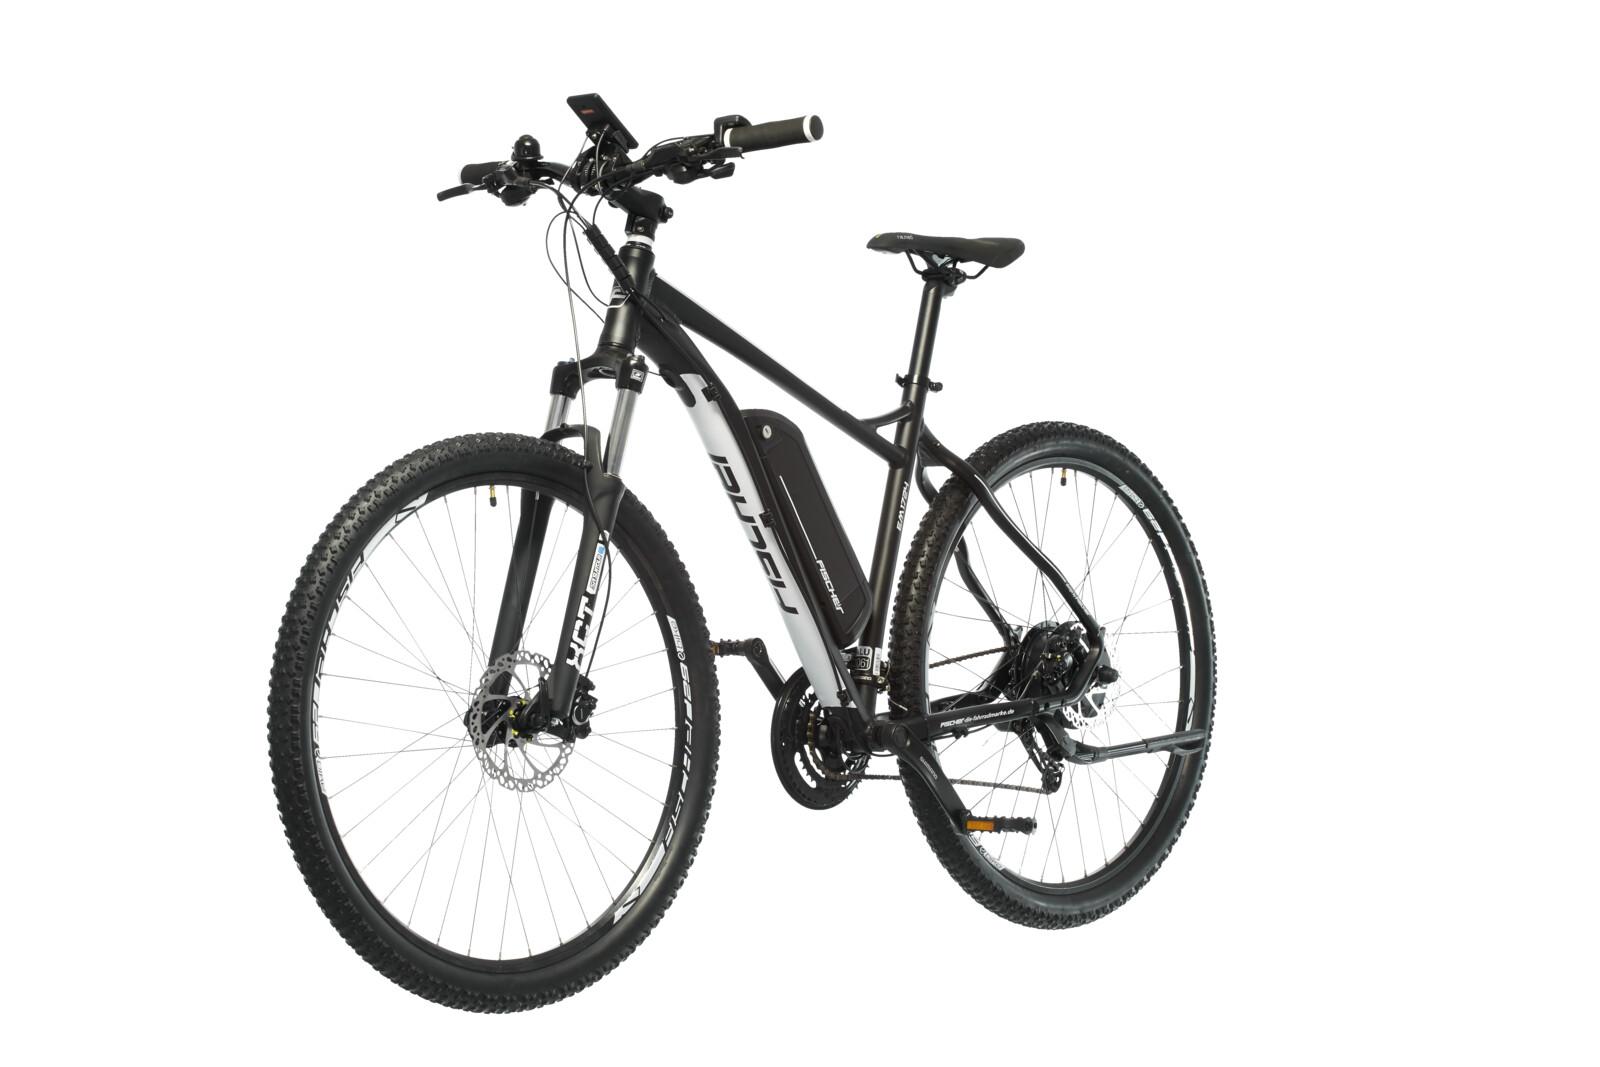 fischer mtb 29 24 g em 1724 r1 pedelec mountainbike 51 cm 29 zoll 25 km h ebay. Black Bedroom Furniture Sets. Home Design Ideas